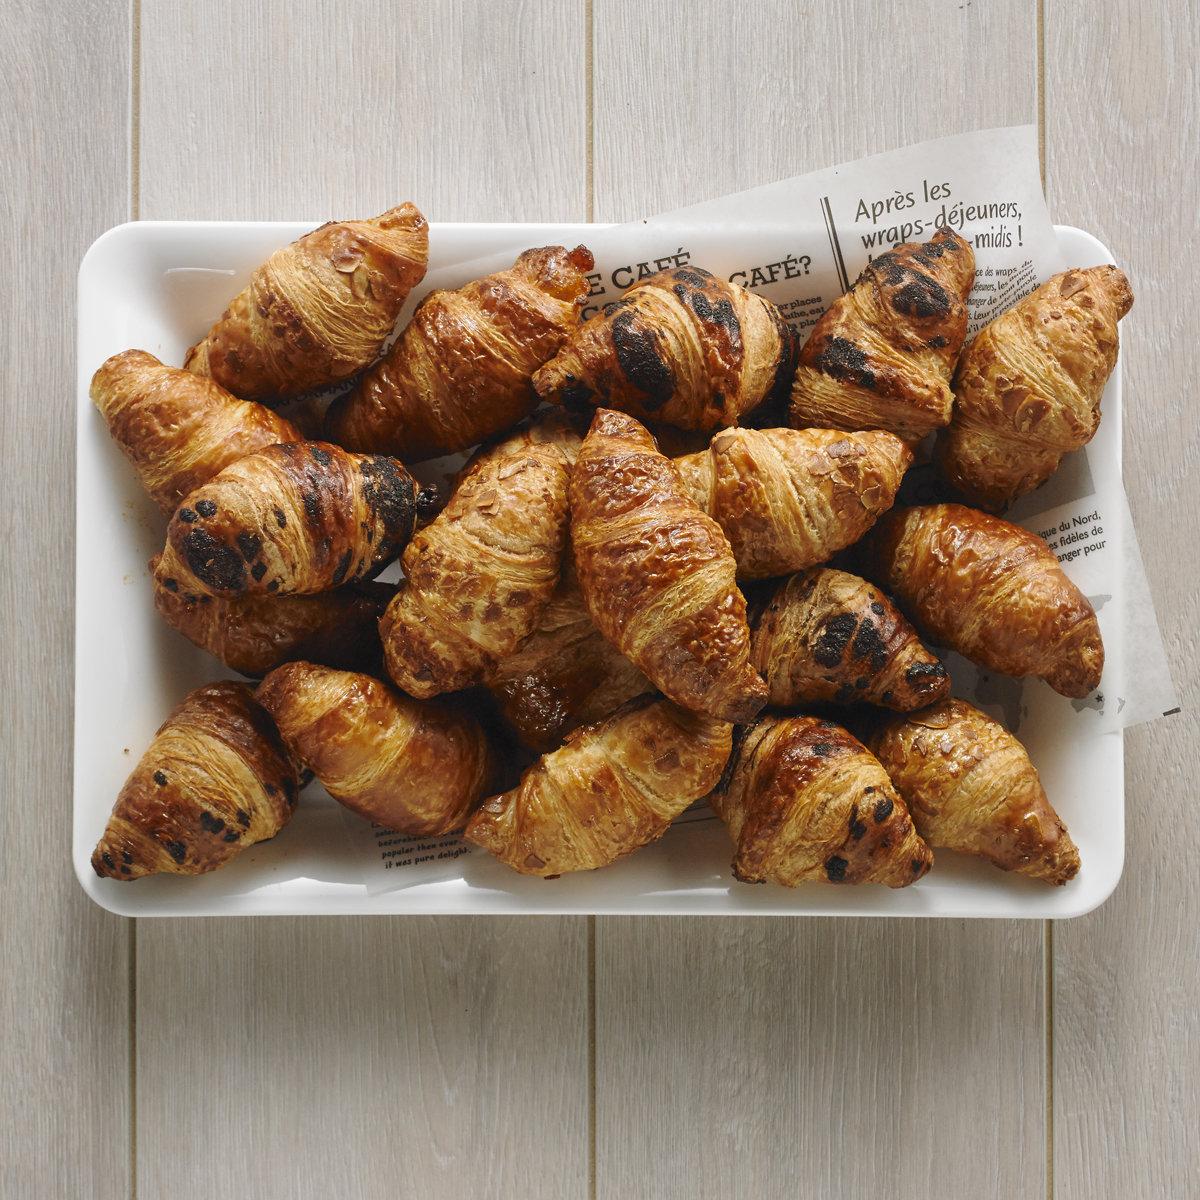 Mini Croissants Platter